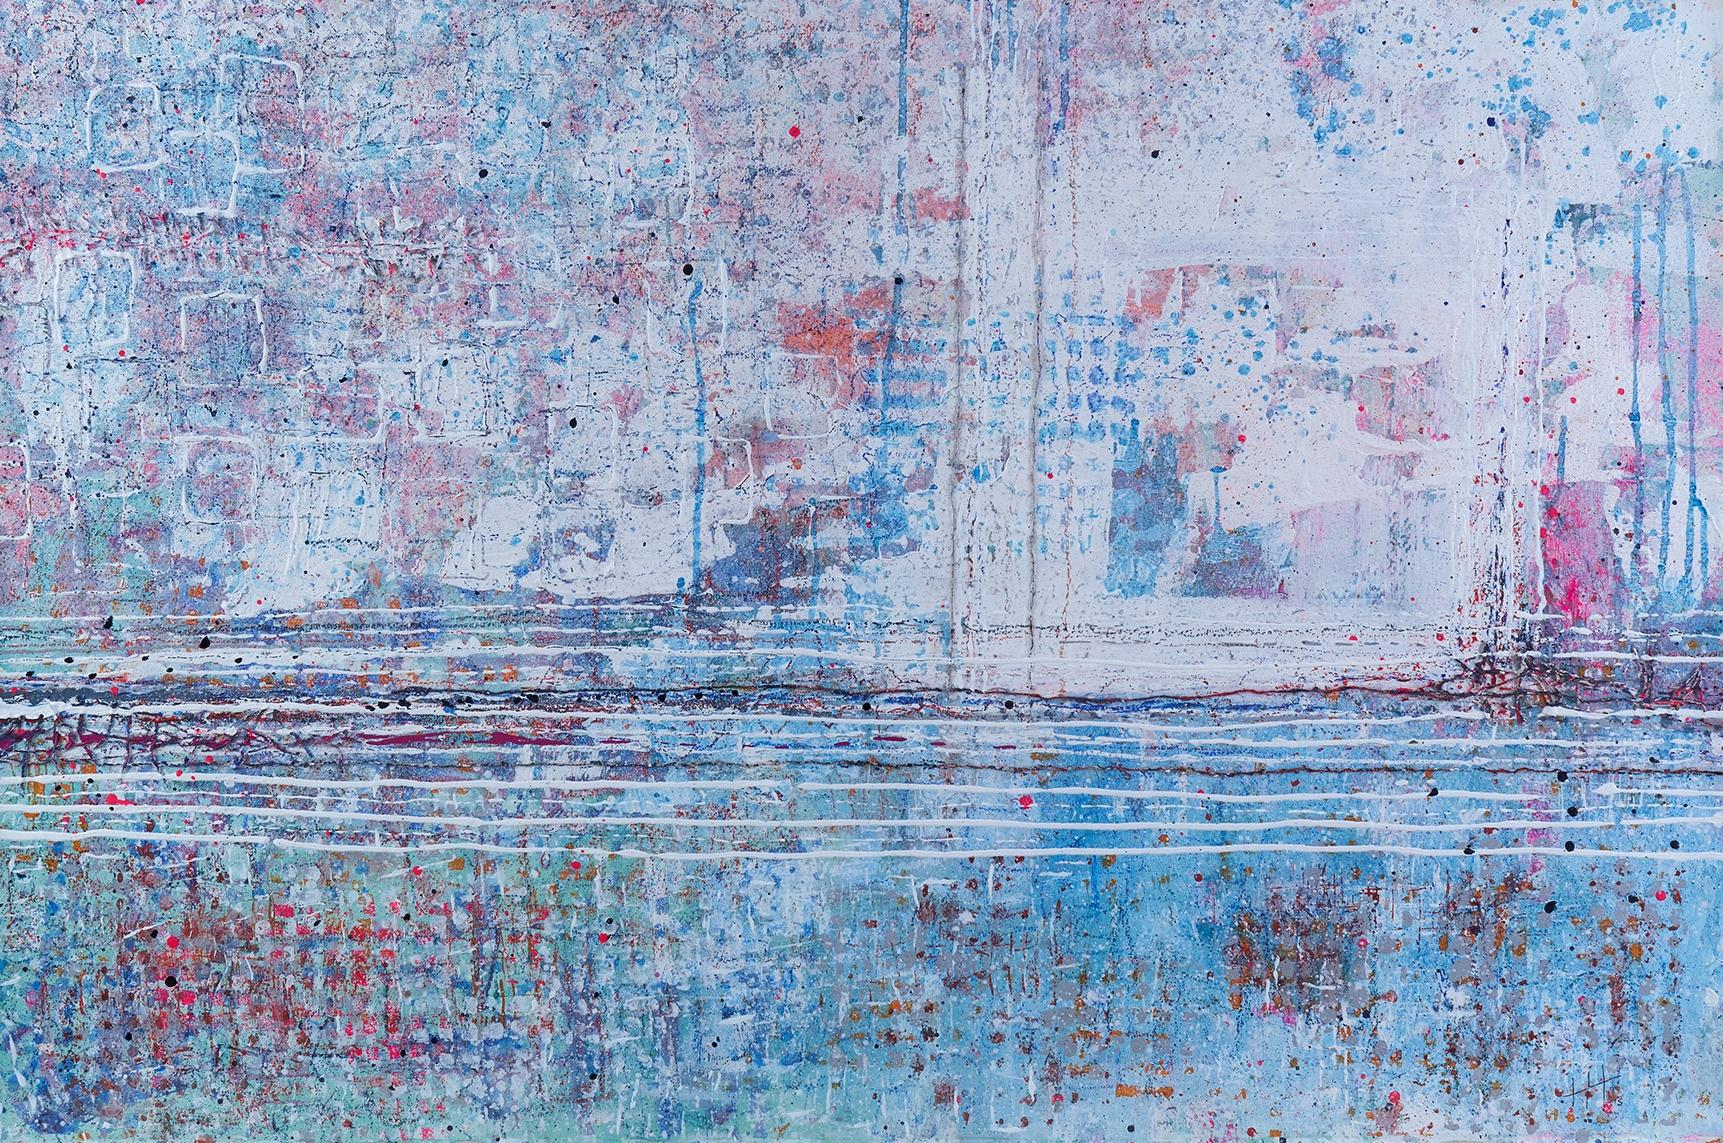 'A Walk With Erica' Acrylic & Mixed Media /93cm x 129cm (framed) SOLD